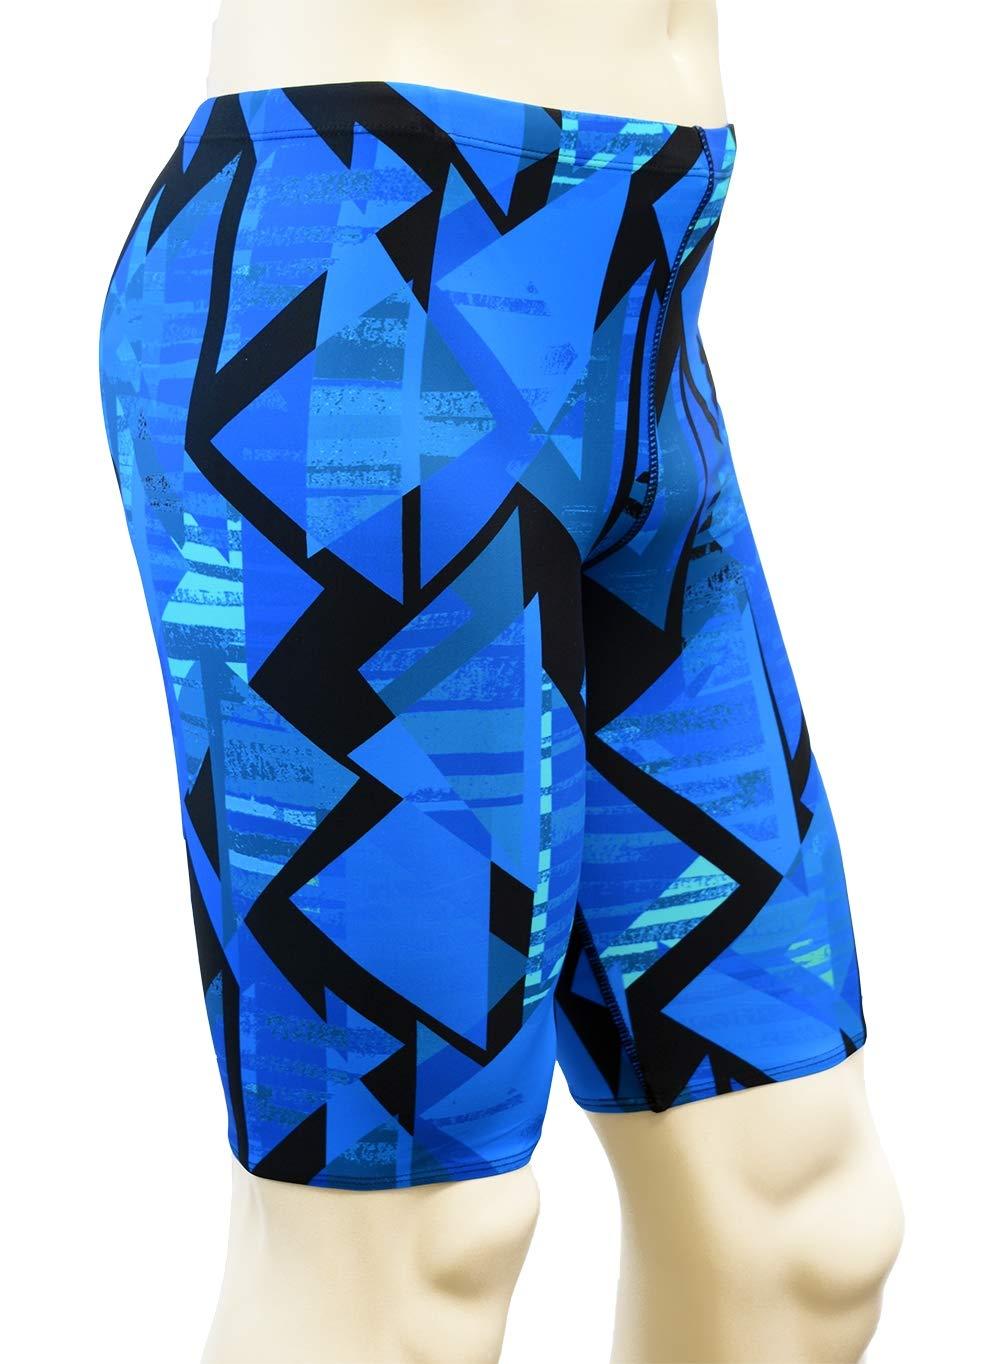 Adoretex Boys//Mens Printed Pro Athletic Jammer Swimsuit Swim Shorts